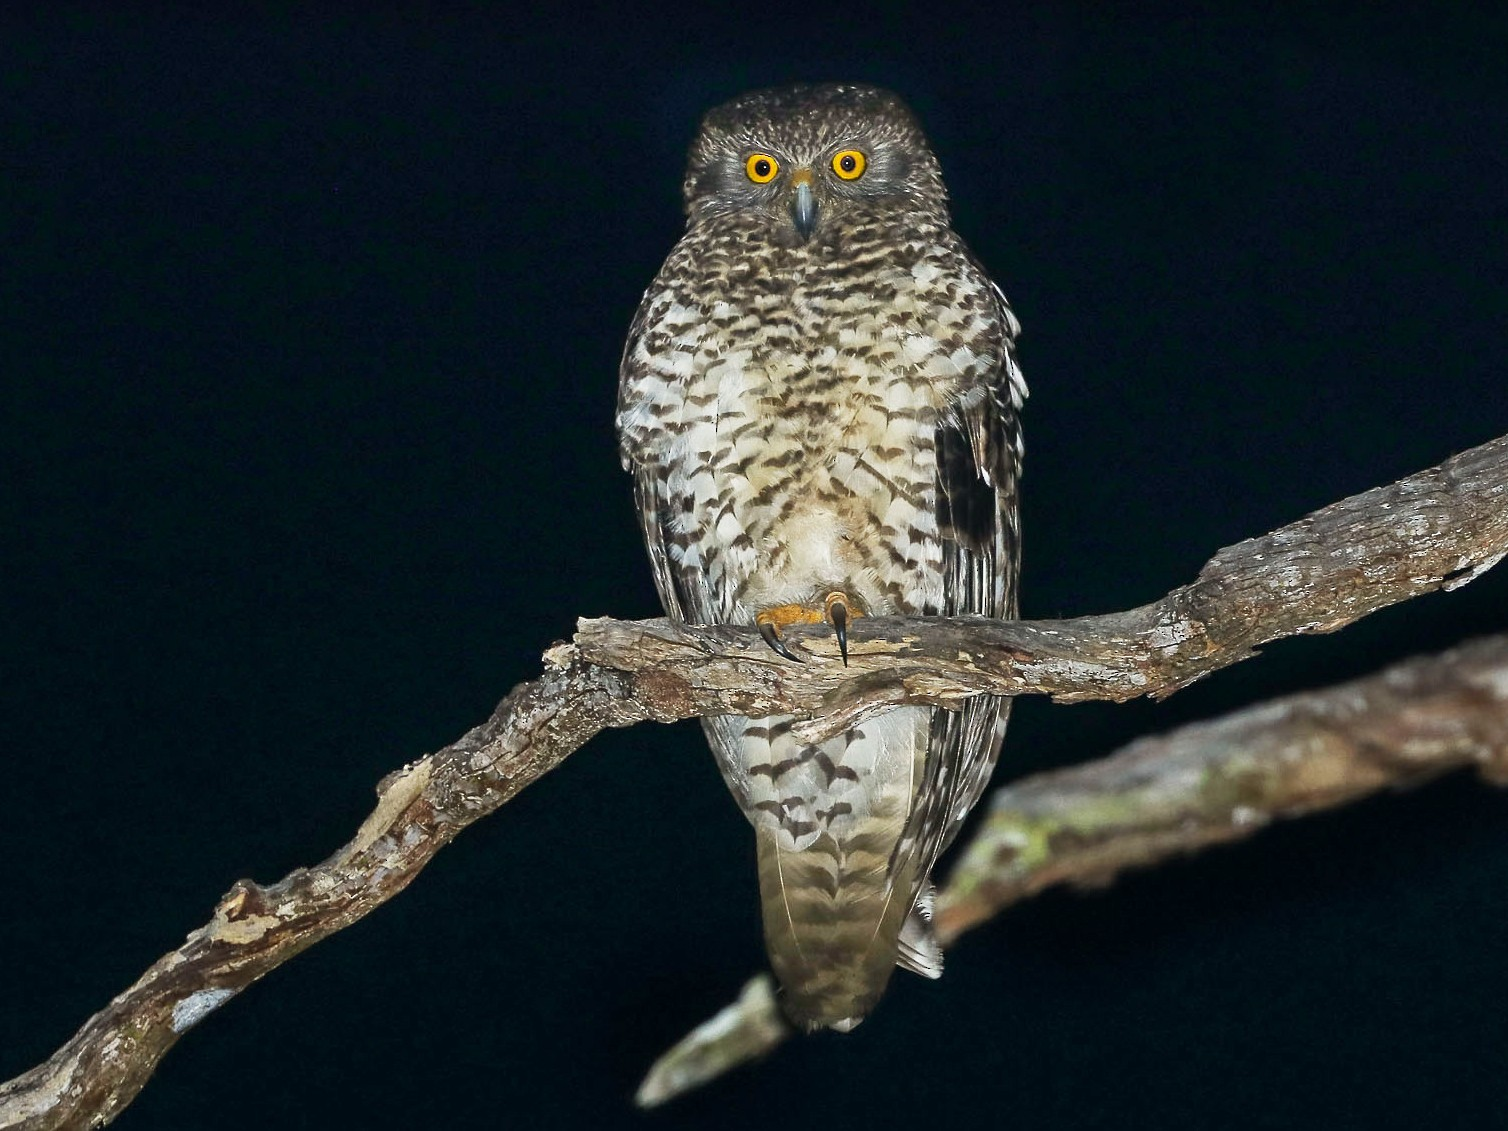 Powerful Owl - Ged Tranter